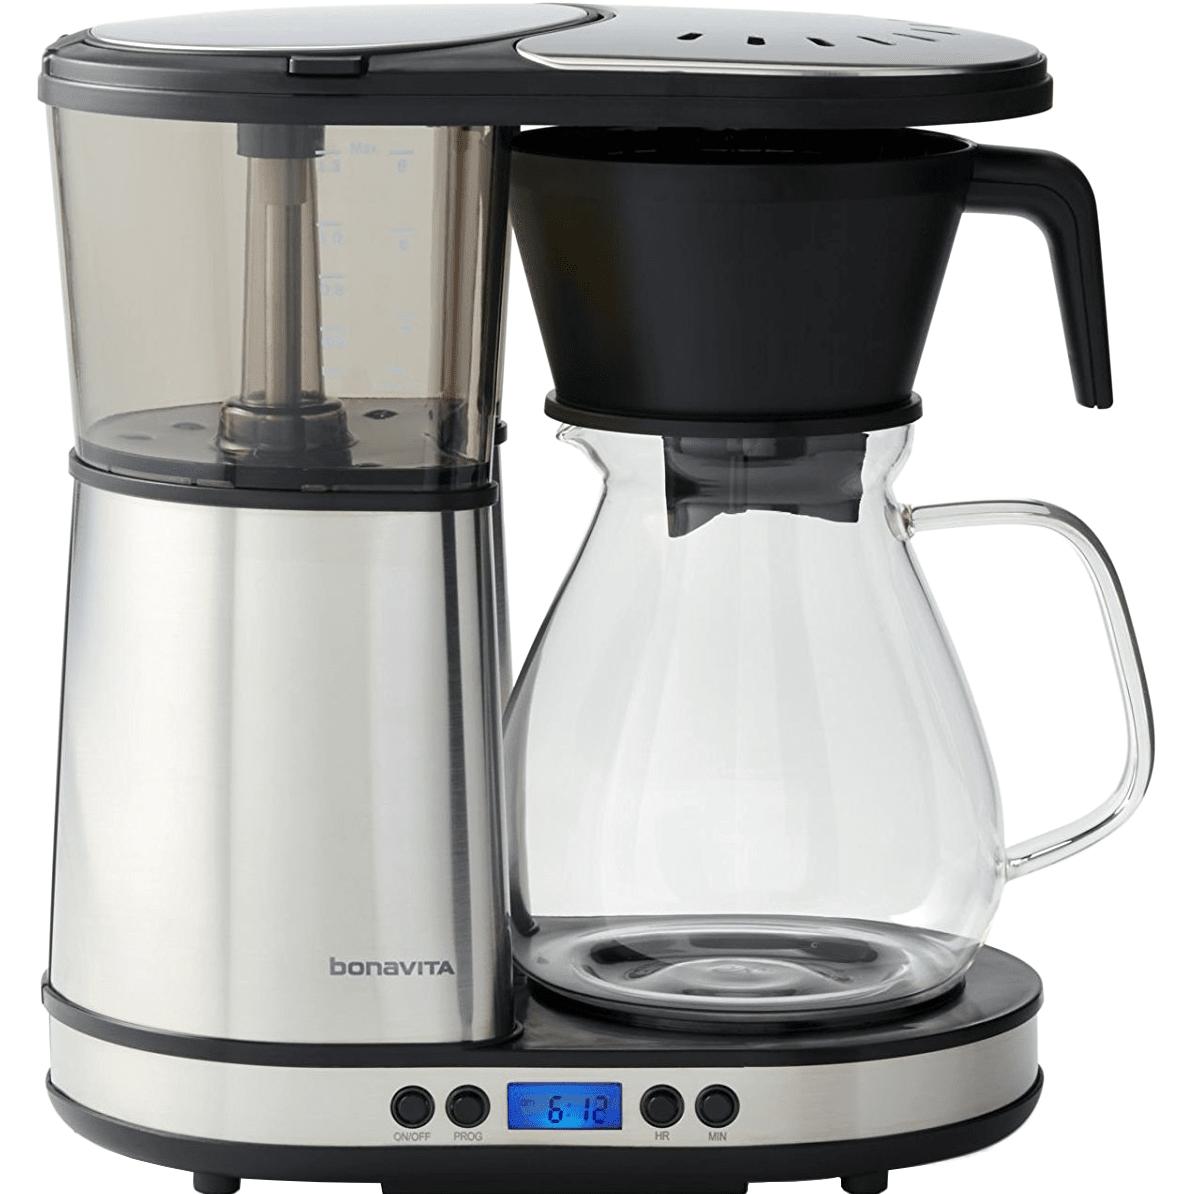 Bonavita Glass Programmable 8-Cup Coffee Maker w/ Hot Plate (BV1902DW)